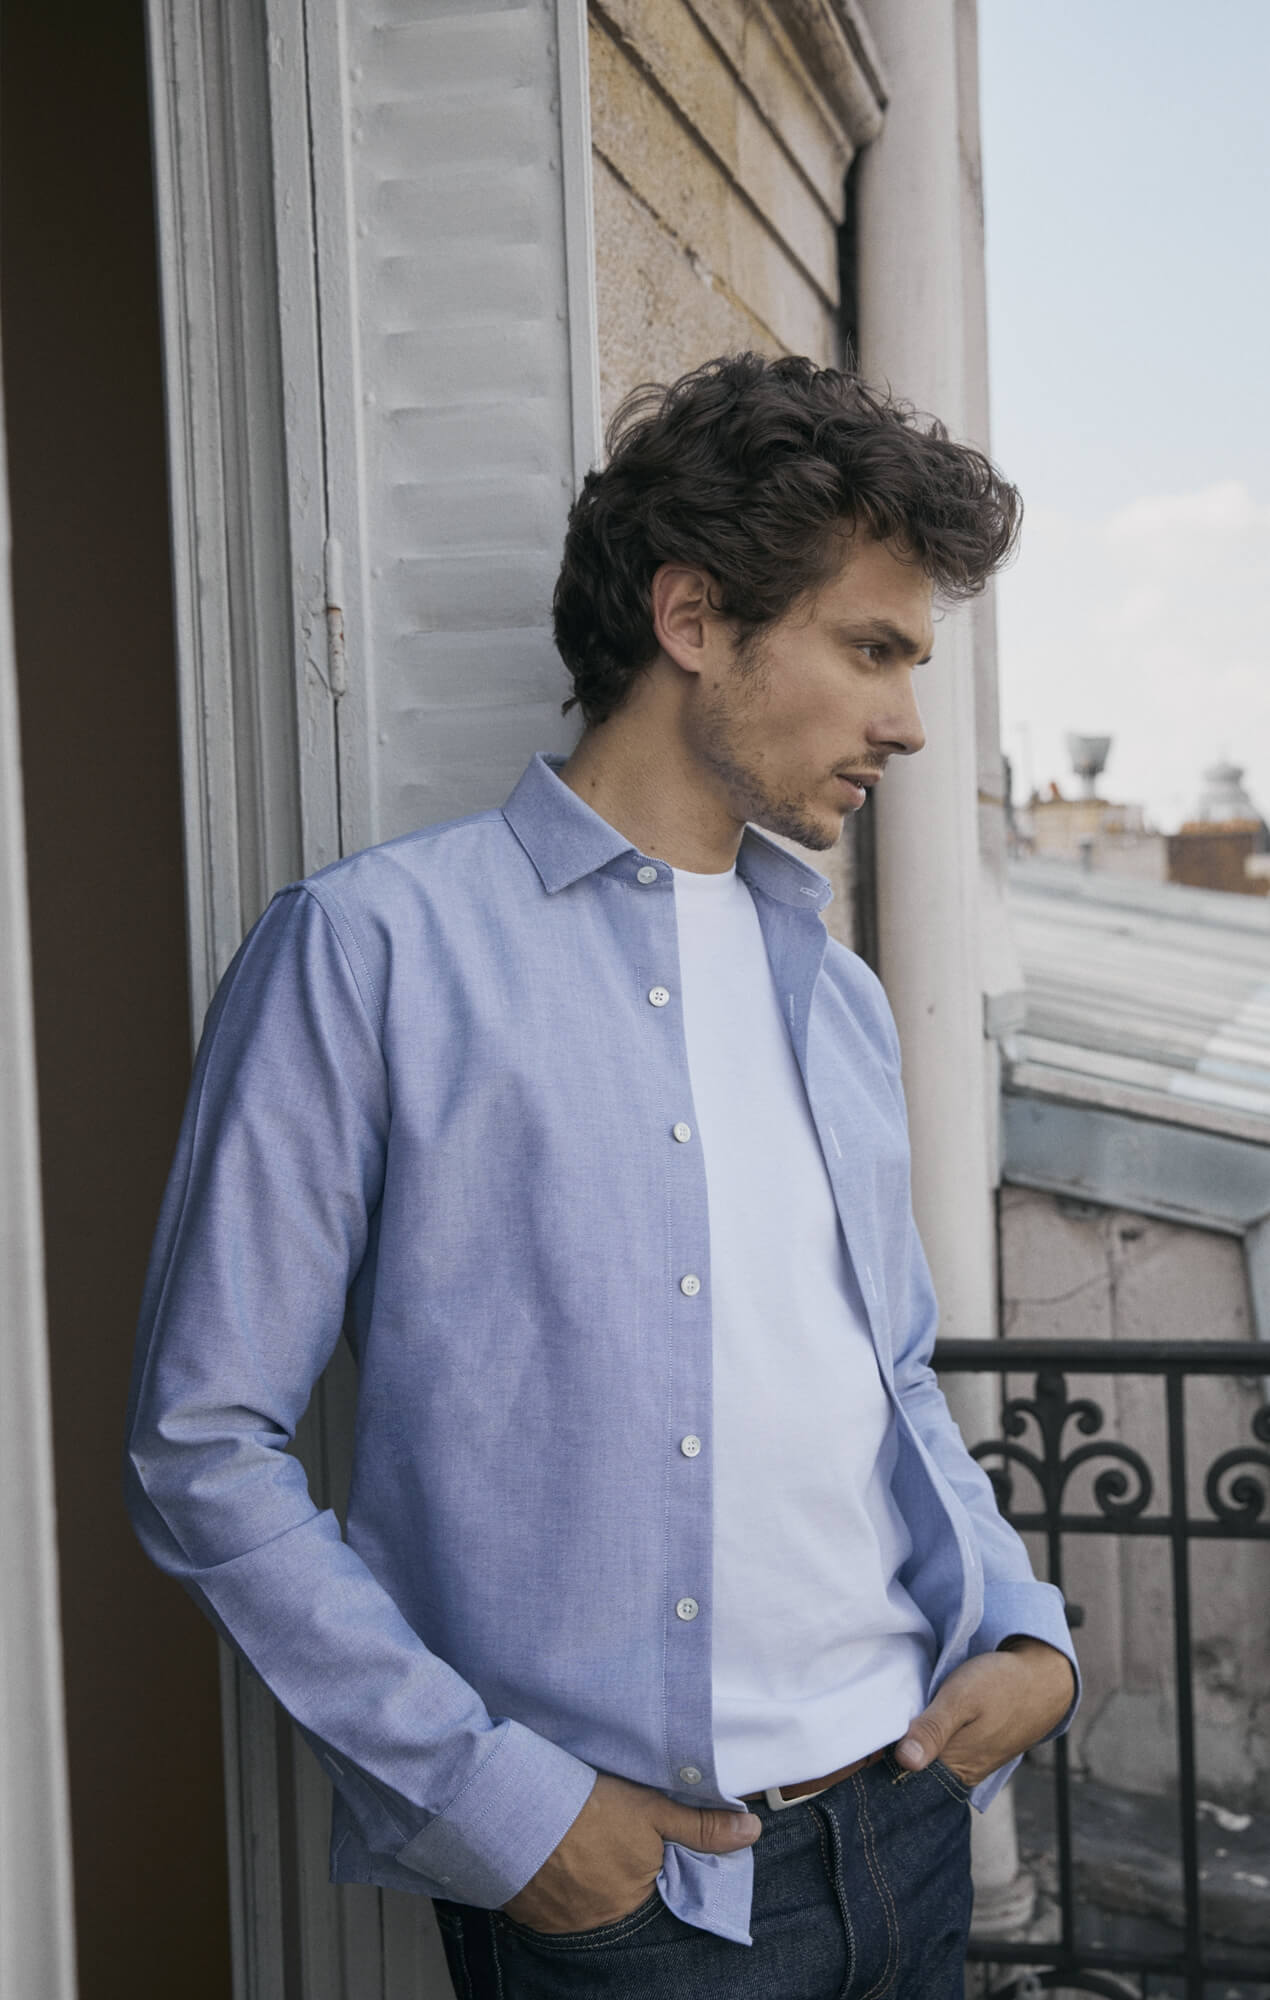 Chemise bleu-gris Oxford Chemises Hommes